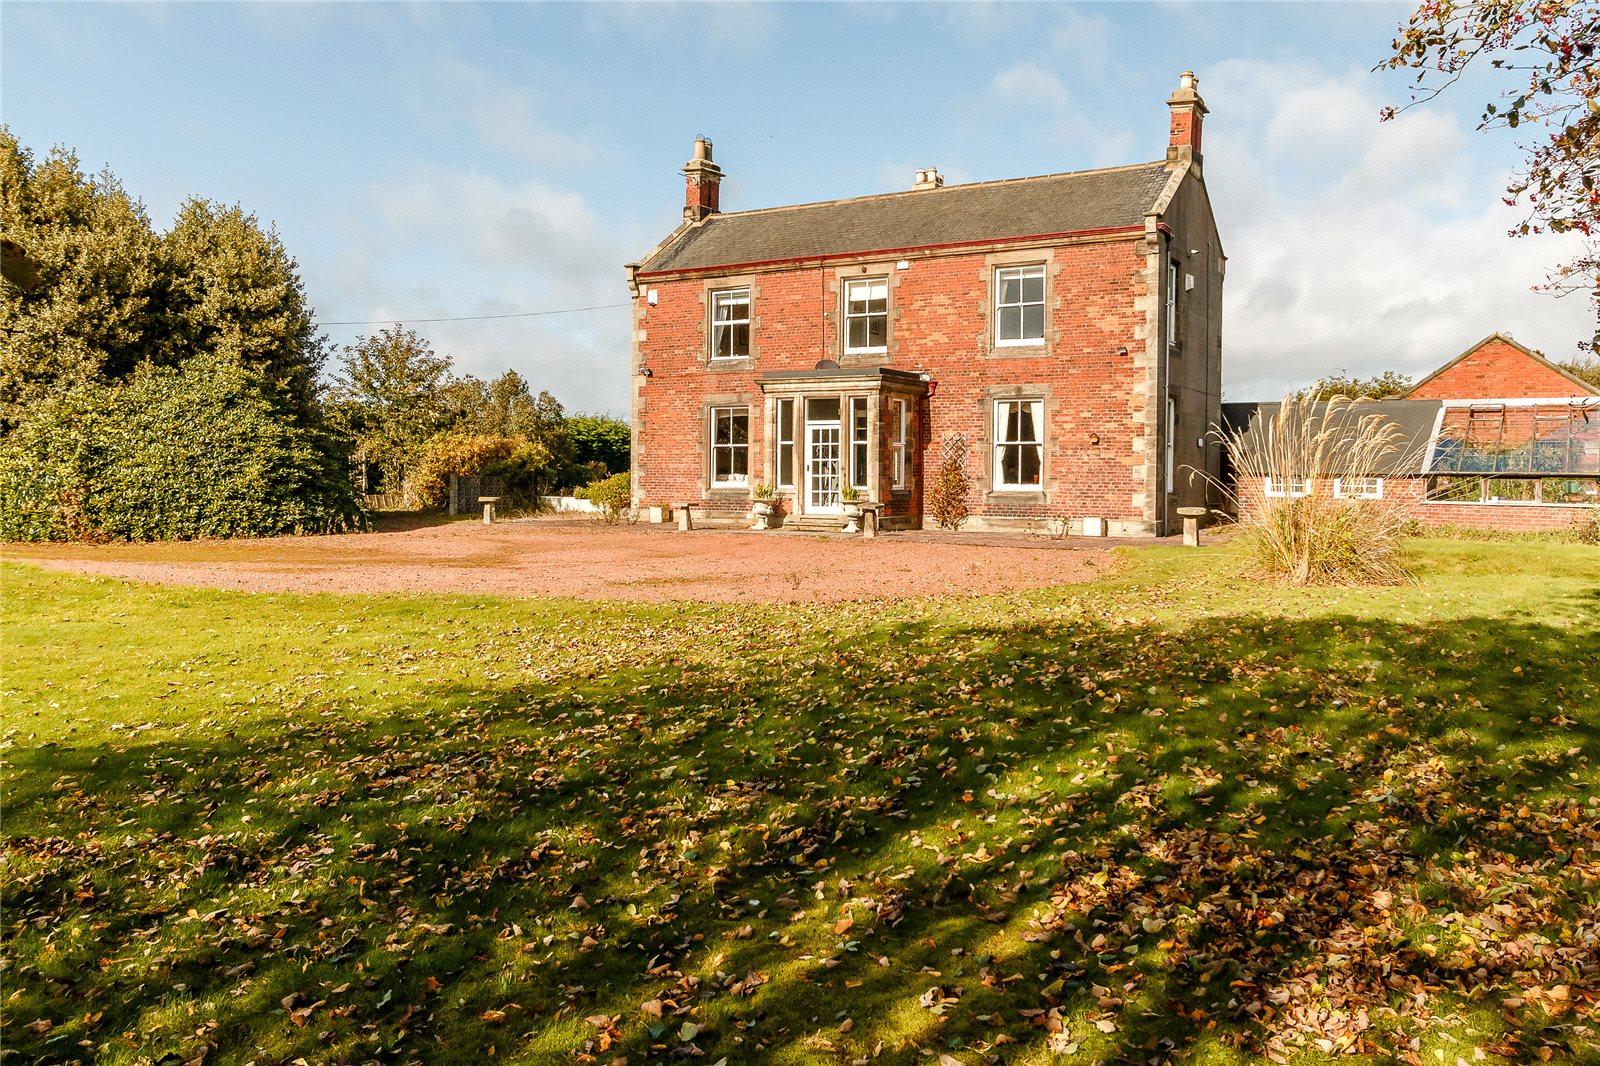 Villa per Vendita alle ore Morpeth, Northumberland, NE61 Morpeth, Inghilterra